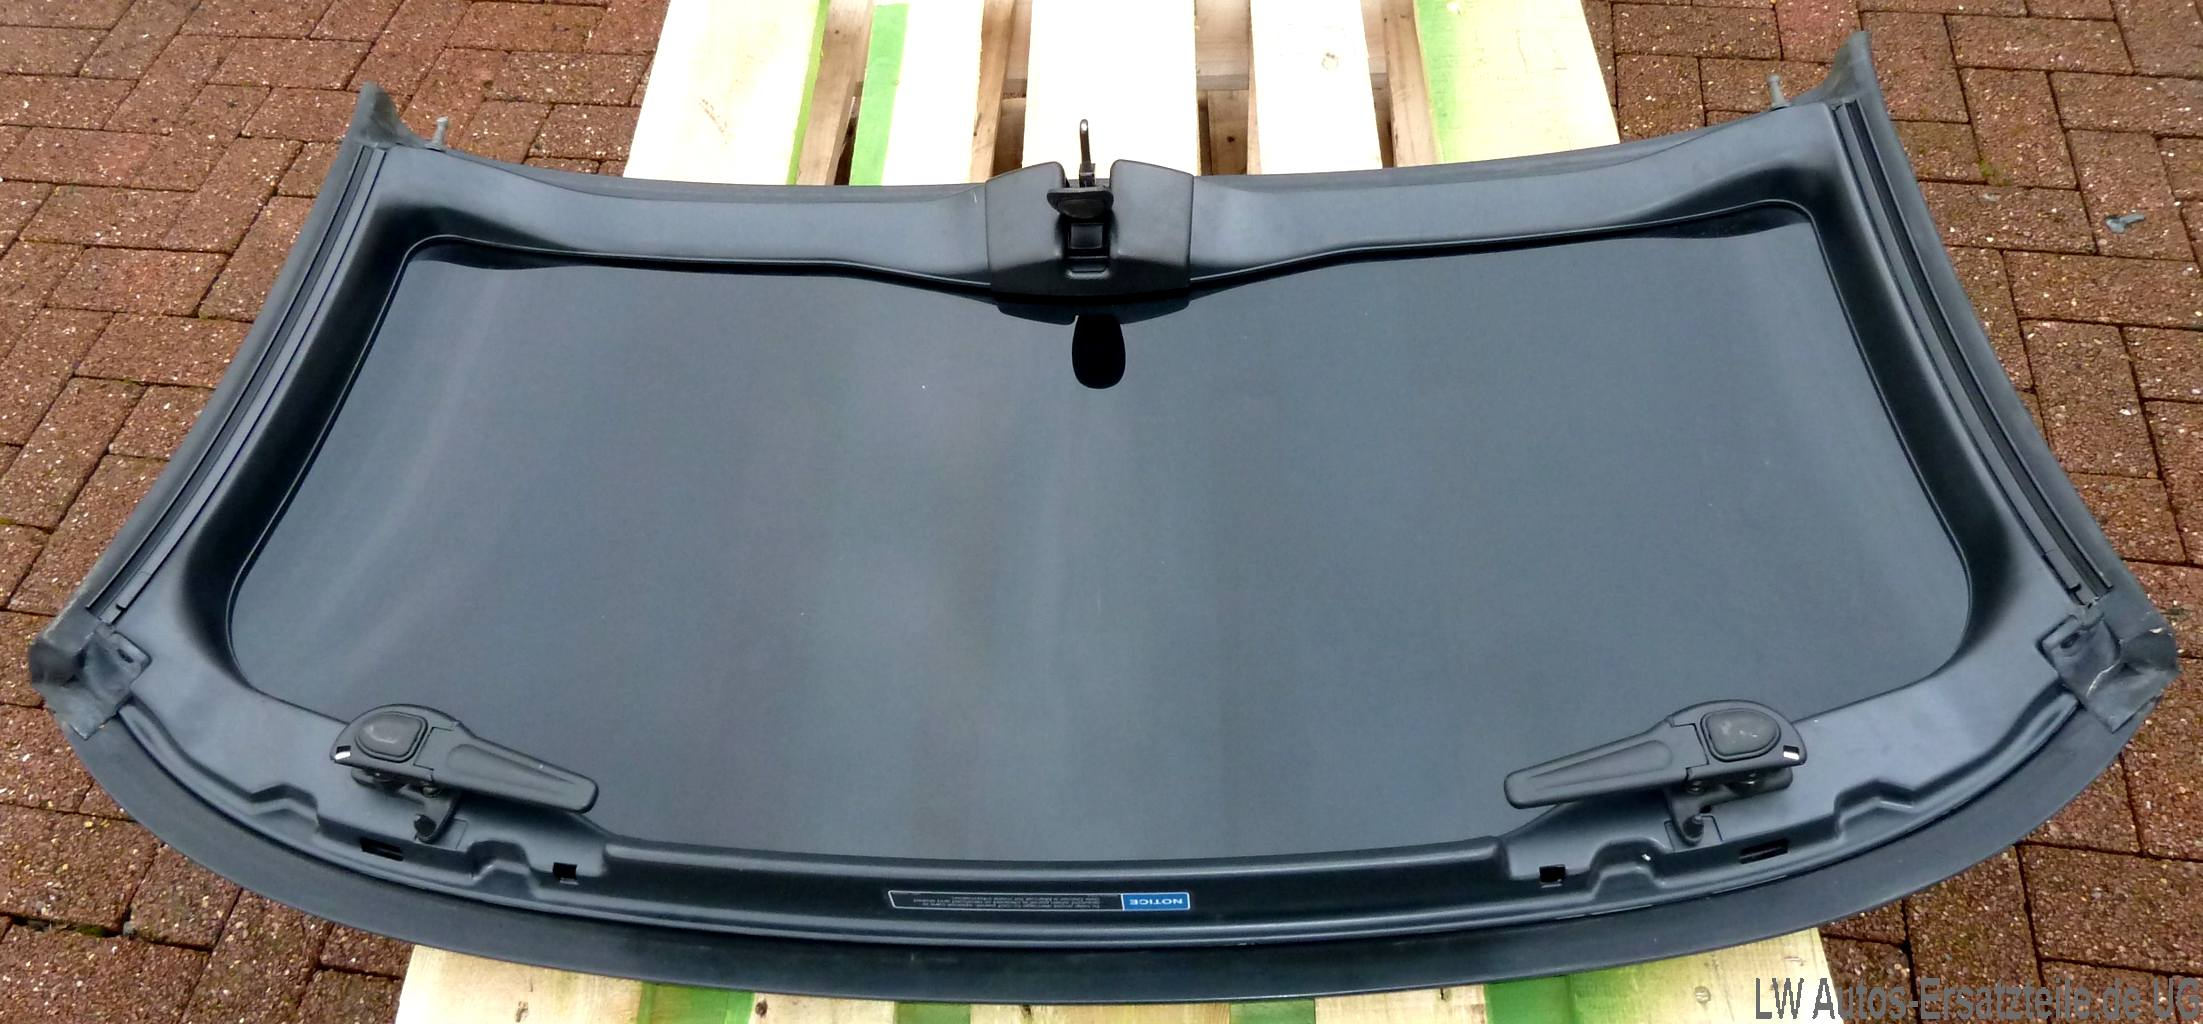 corvette c5 targa glasdach glass targadach ebay. Black Bedroom Furniture Sets. Home Design Ideas